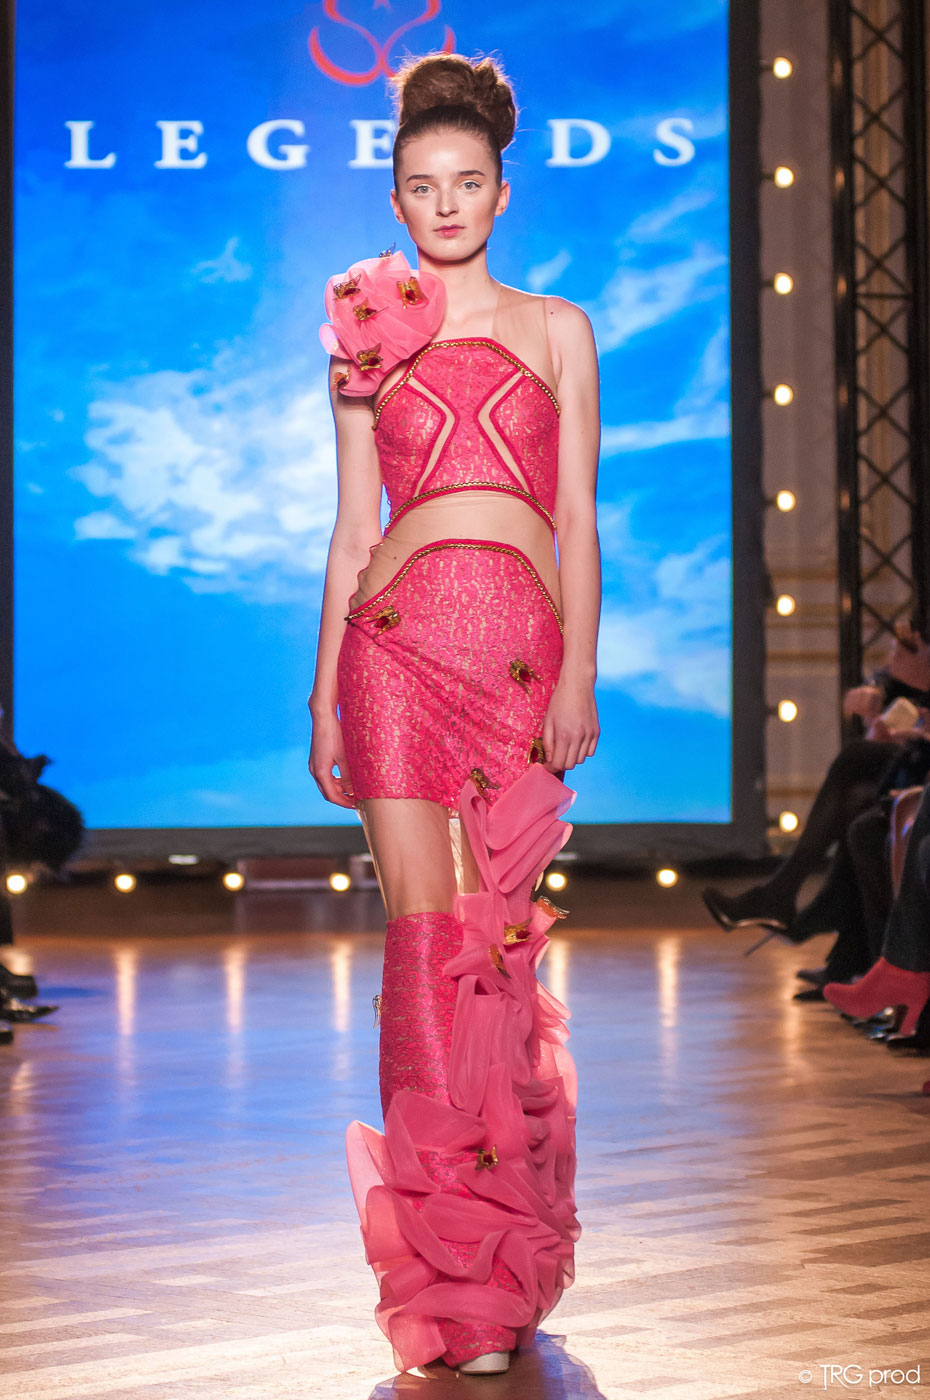 Legends-fashion-runway-show-haute-couture-paris-spring-2015-the-impression-17